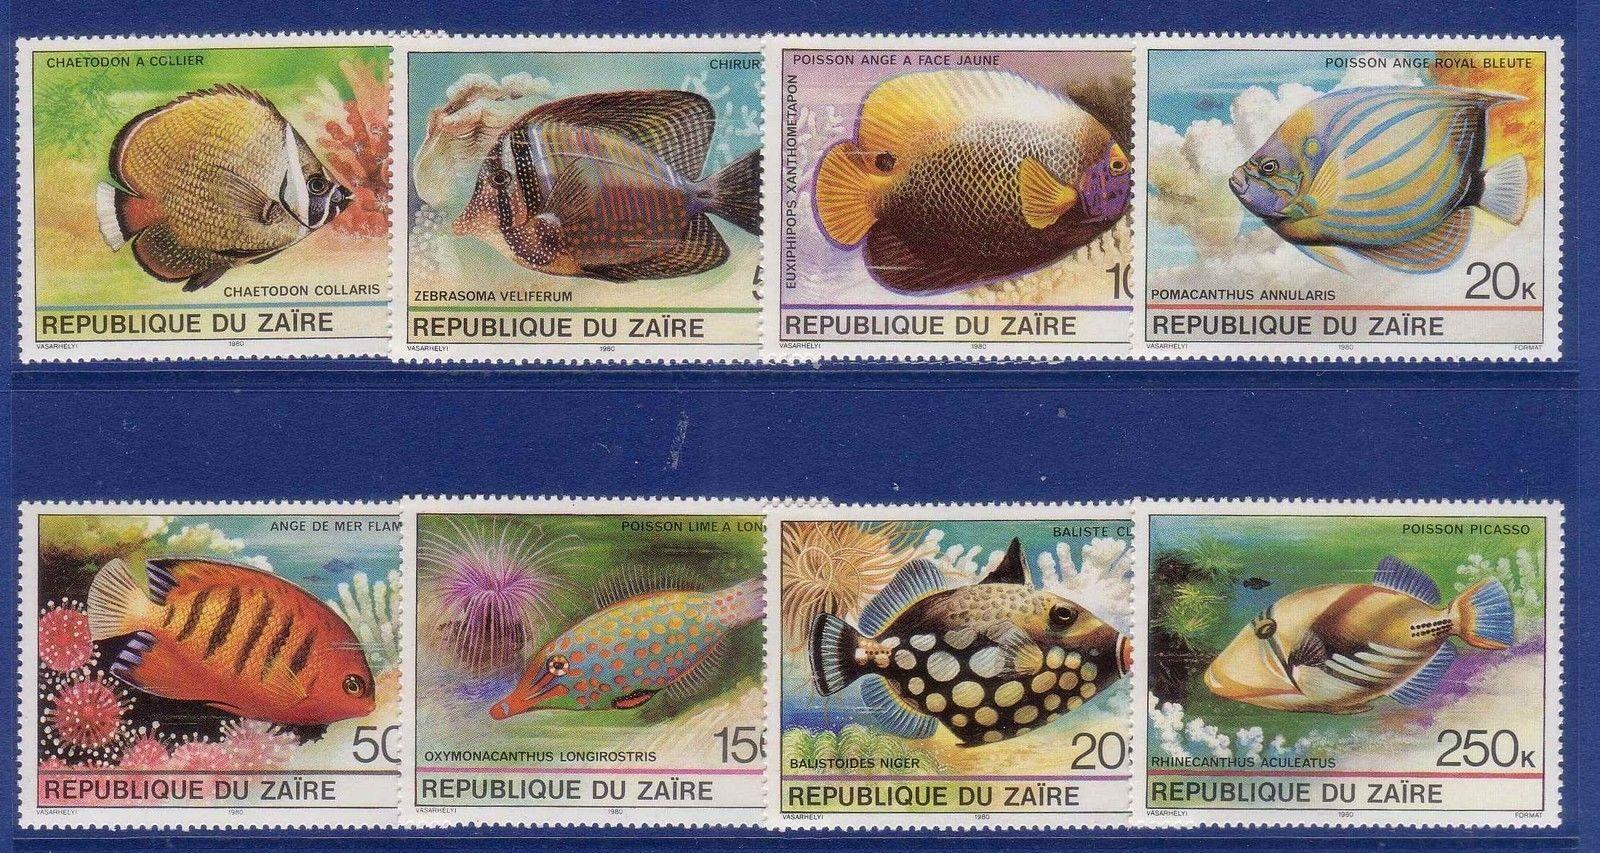 November 2014 wildlife stamp store for Fish symboled stamp